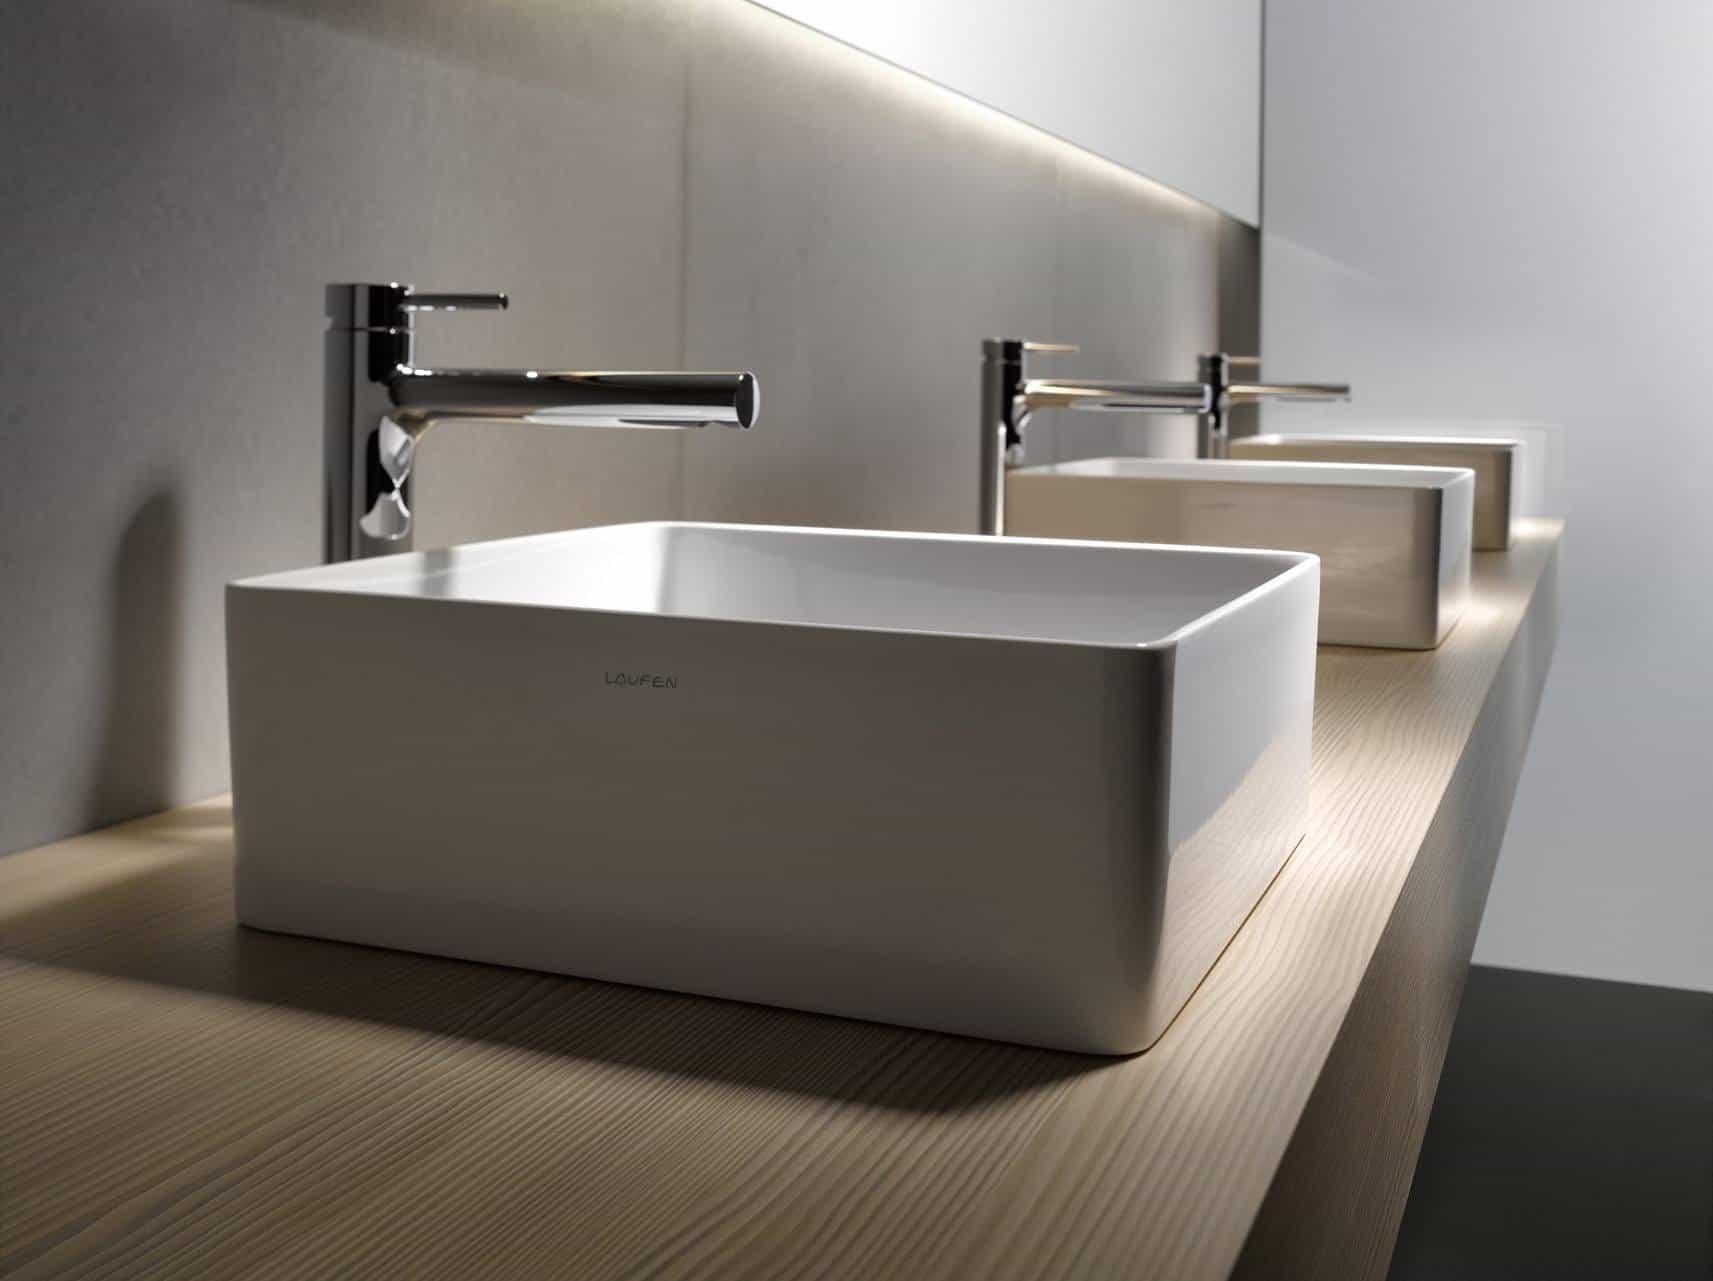 Modern Bathroom Fixtures Part - 20: Modern Bathroom Renovations You Should Consider